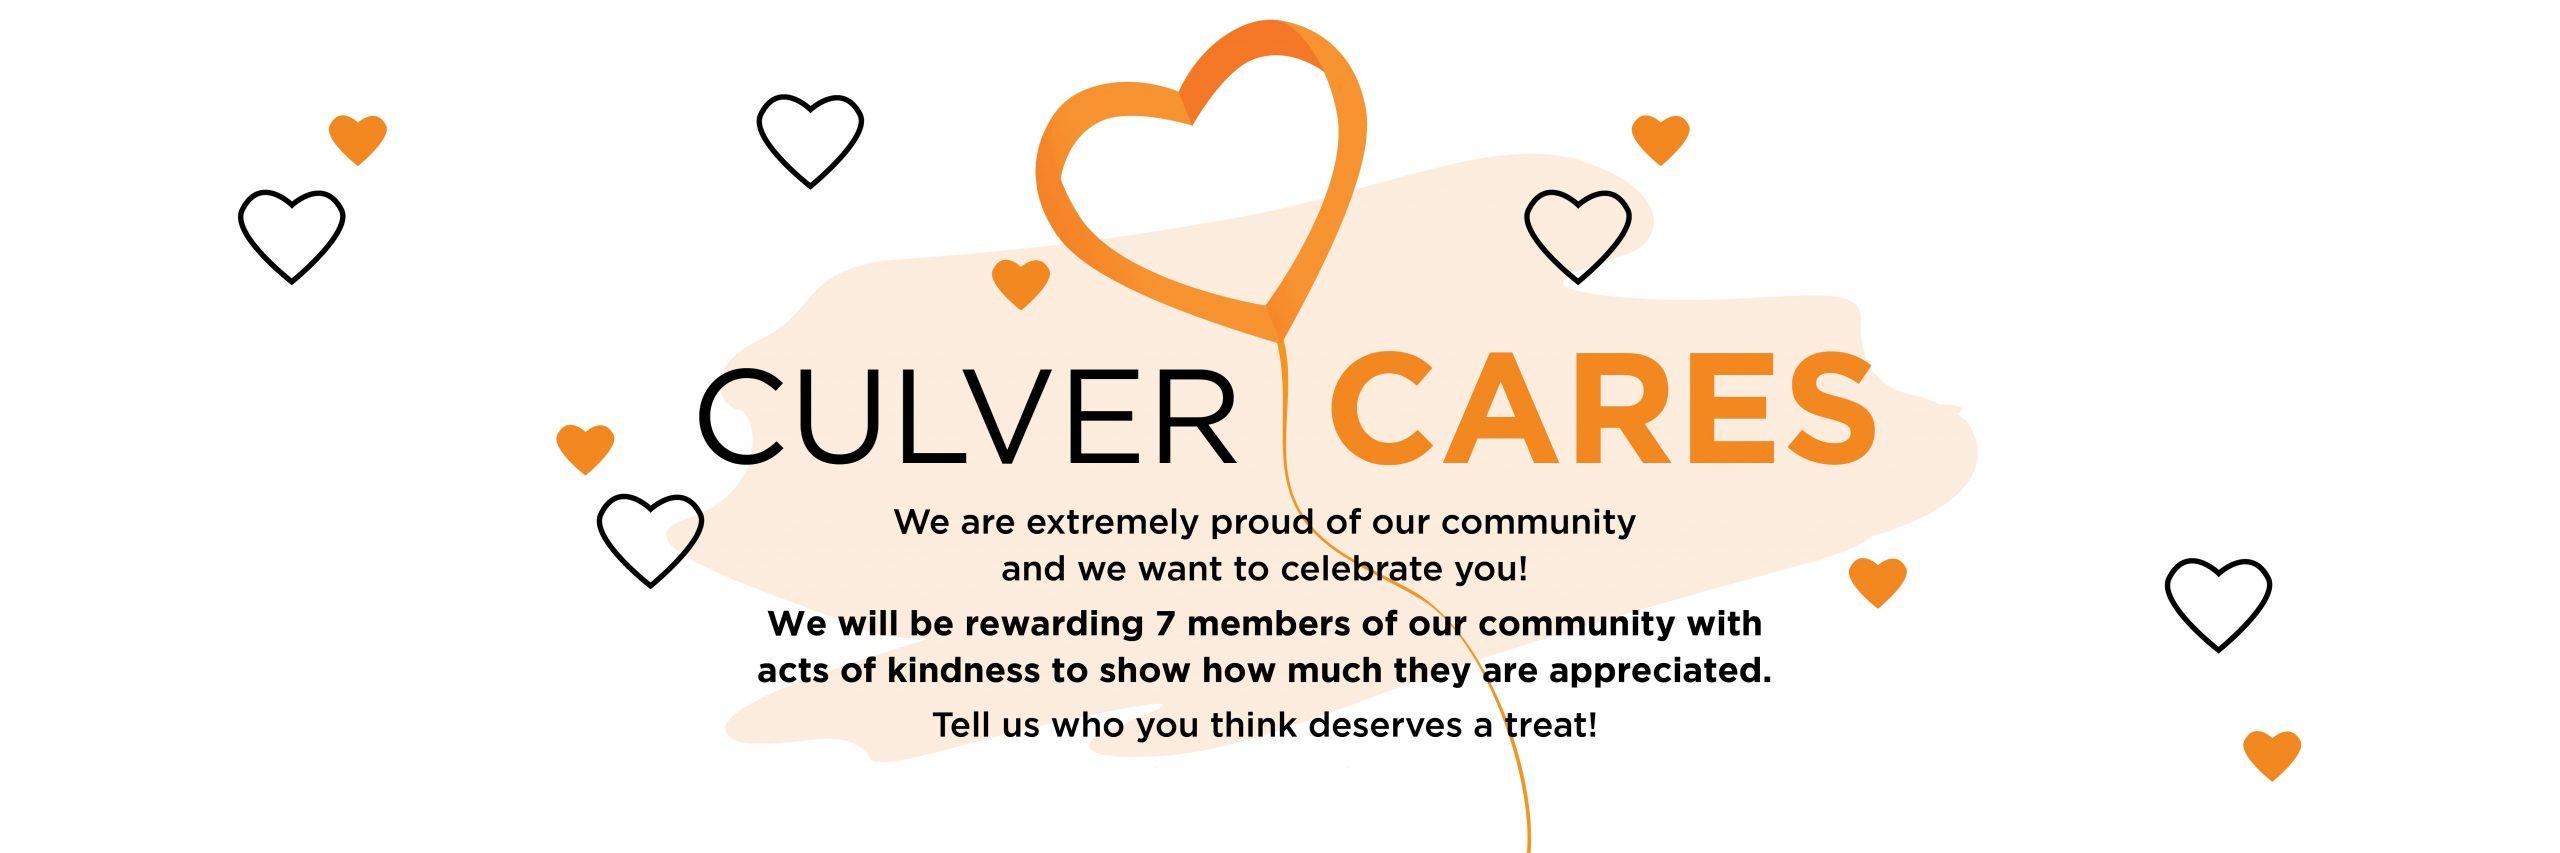 Culver Cares